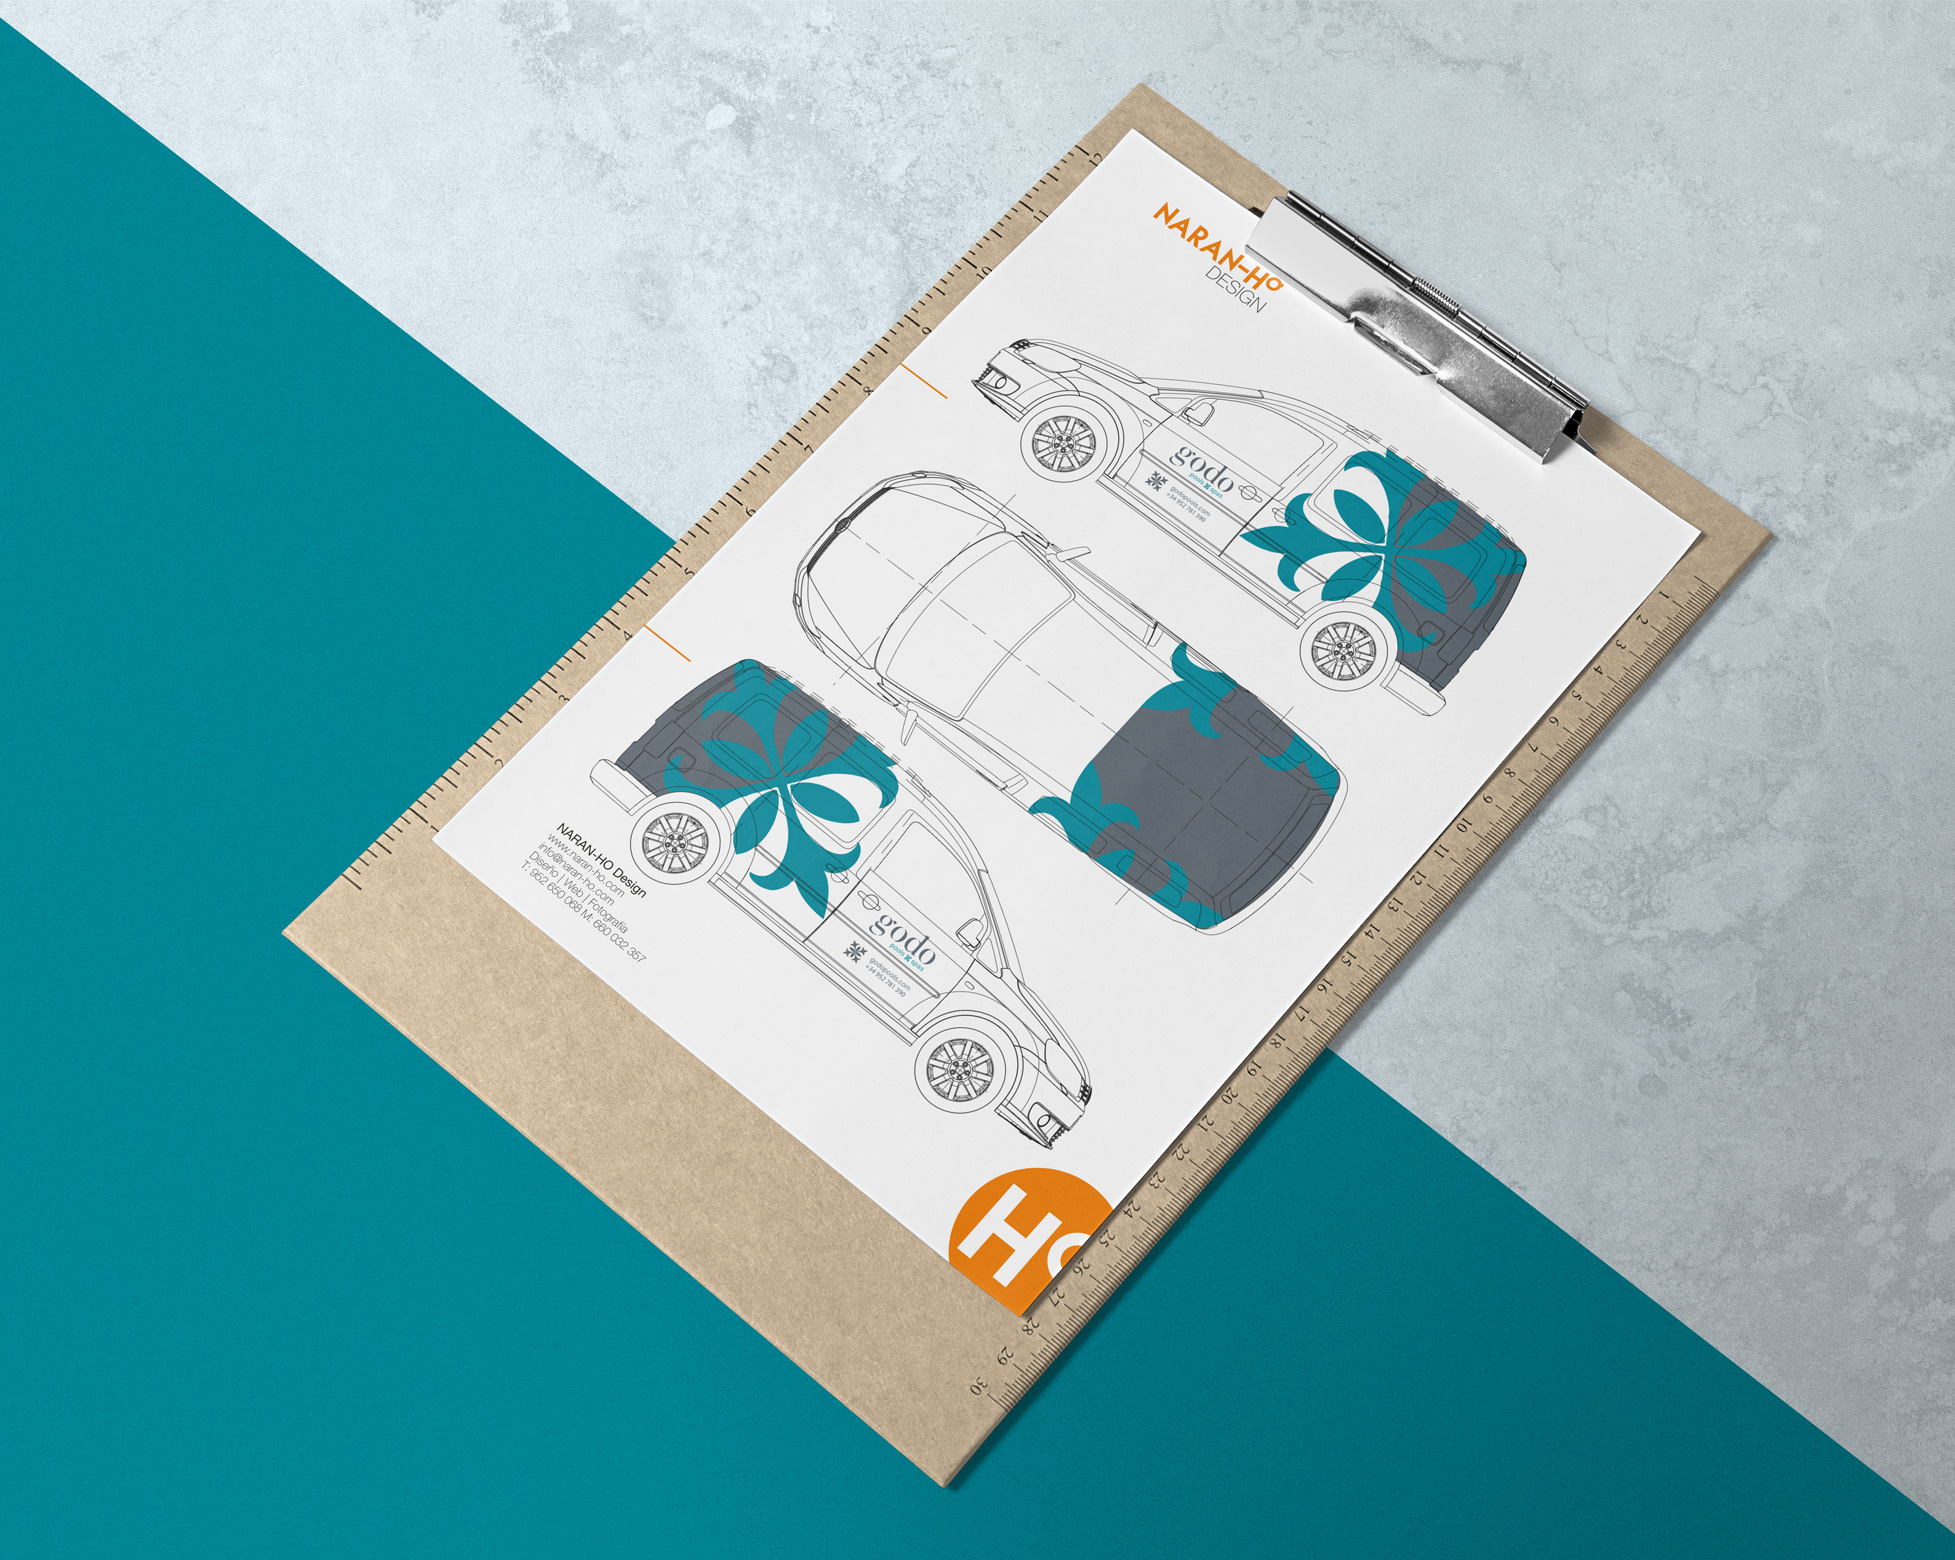 Diseño Rotulado coches corporativos by NARAN-HO Design